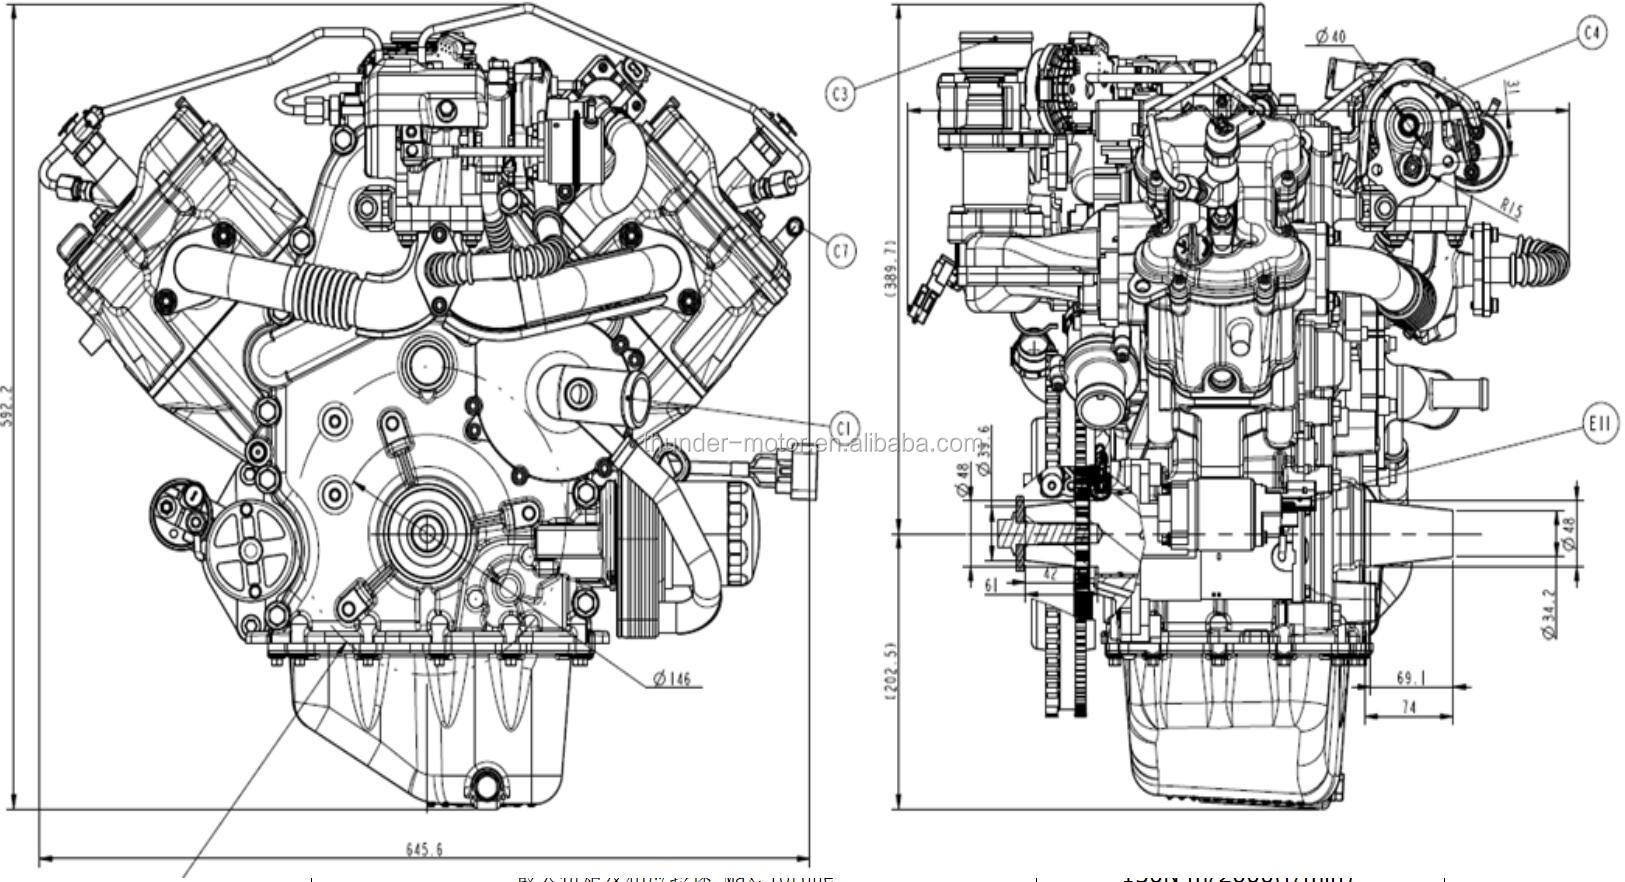 Hercules Utv Atv Off Road Vehiclesel Engine With Turbo